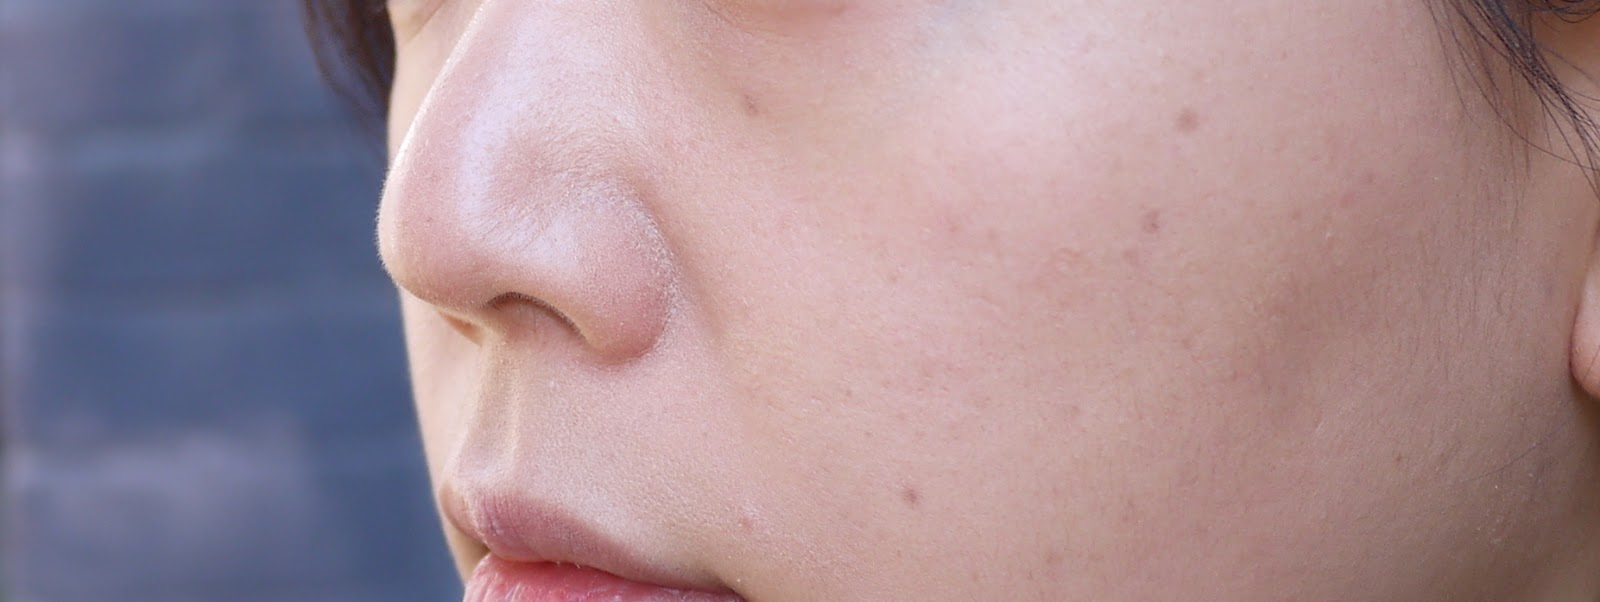 Estee Lauder Daywear BB Anti-Oxidant Beauty Benefit Cream SPF35 review